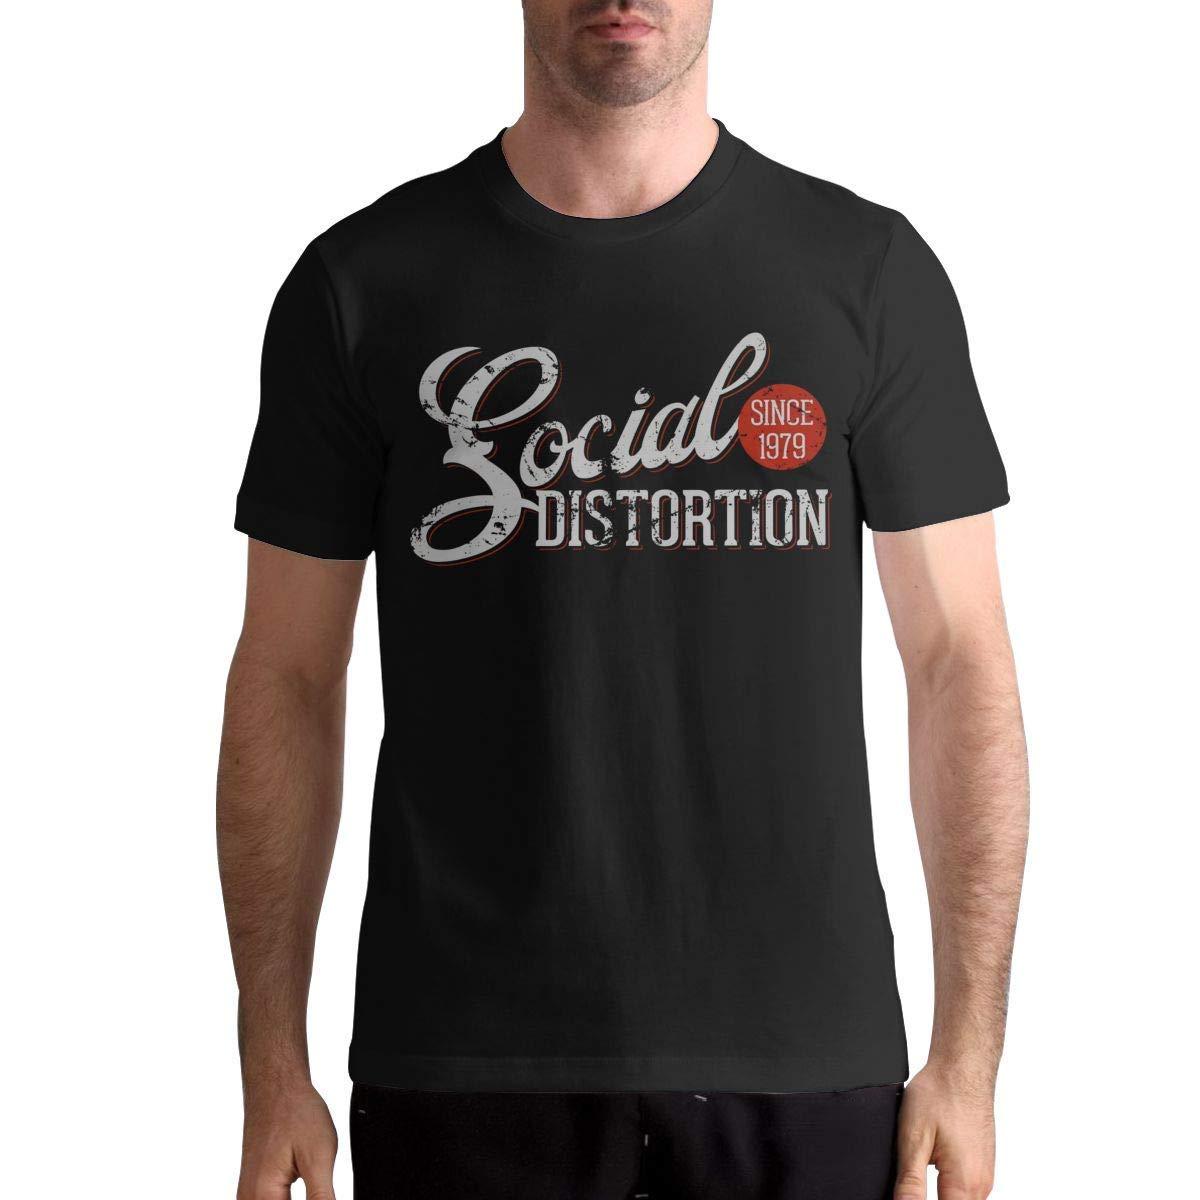 Social Distortion T Shirt S T Shirt Fashion Sports Tops Round Neck Short Sleeve Tee